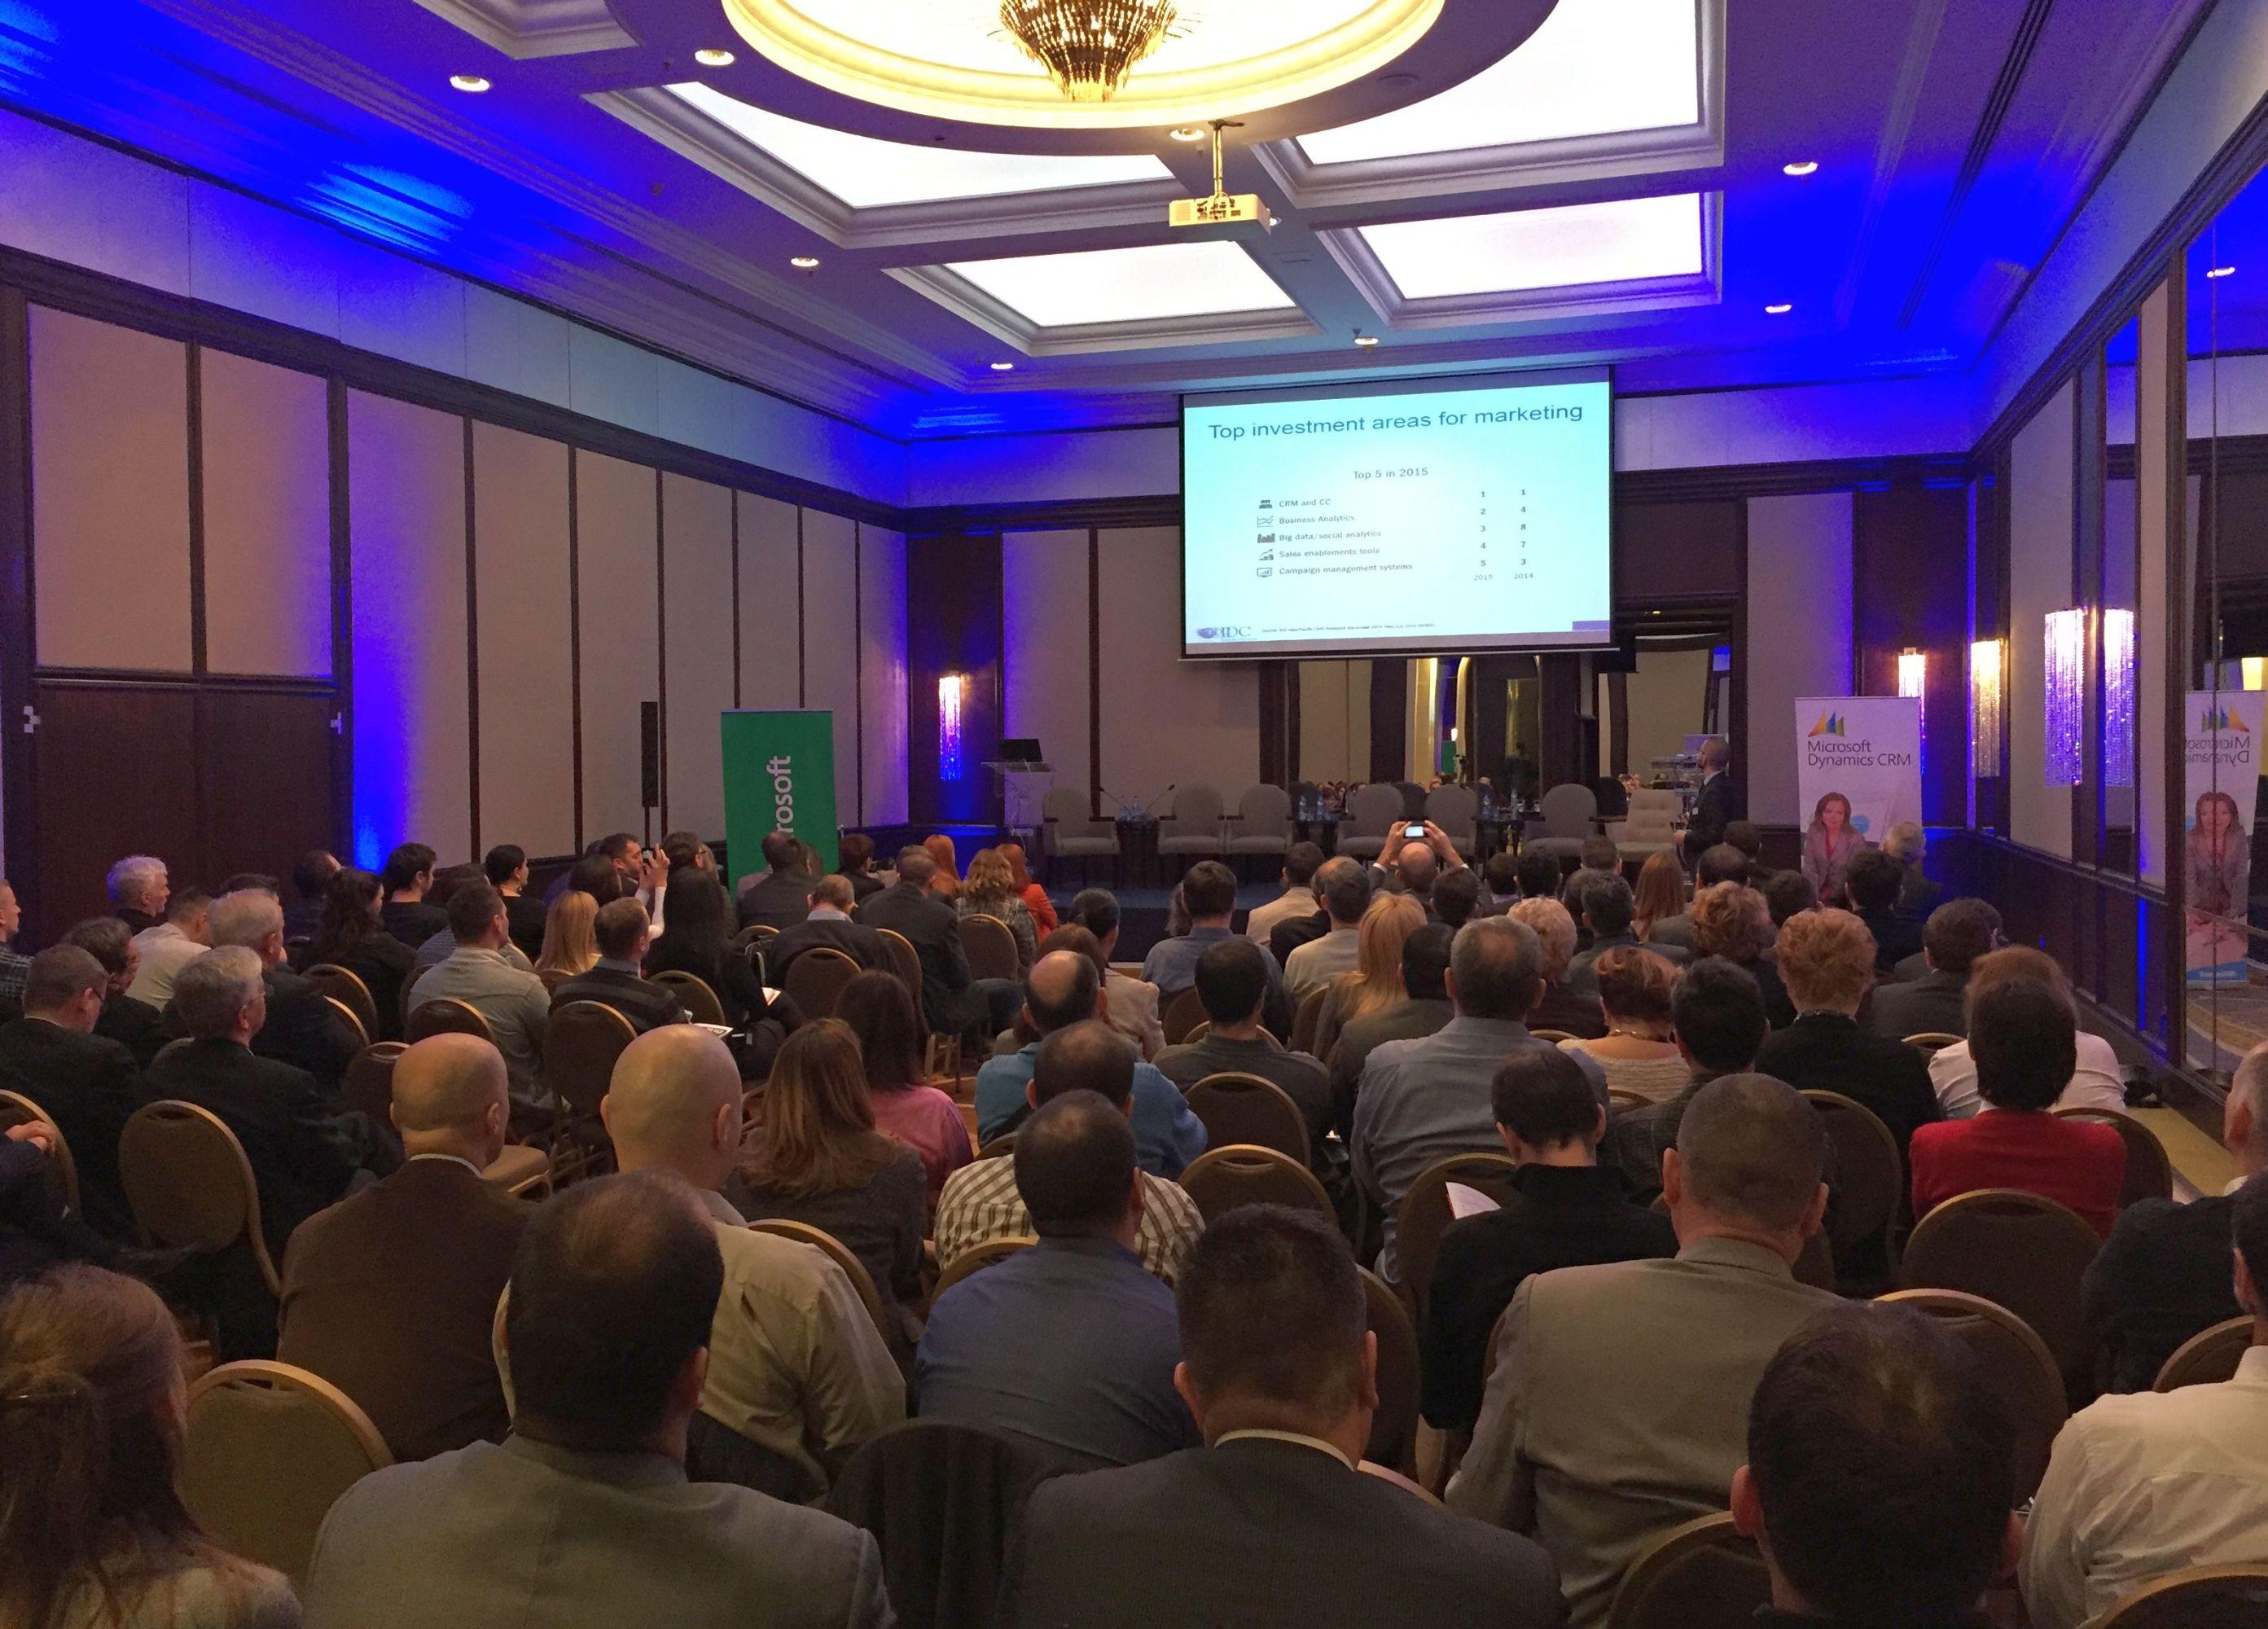 Microsoft IDC - CRM online event